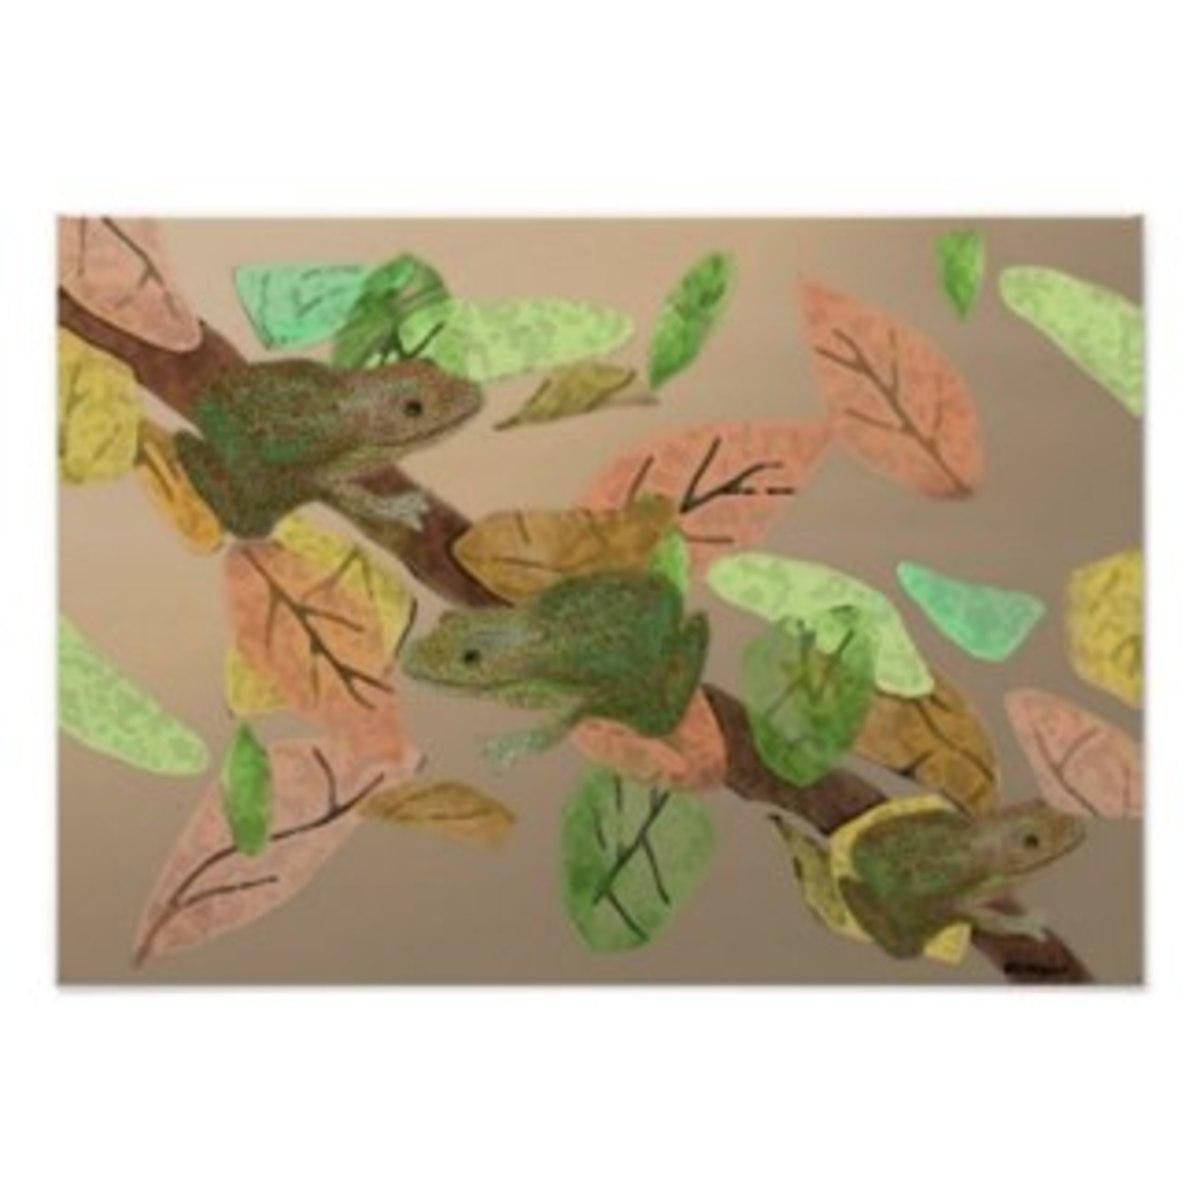 Frog Habitat Print